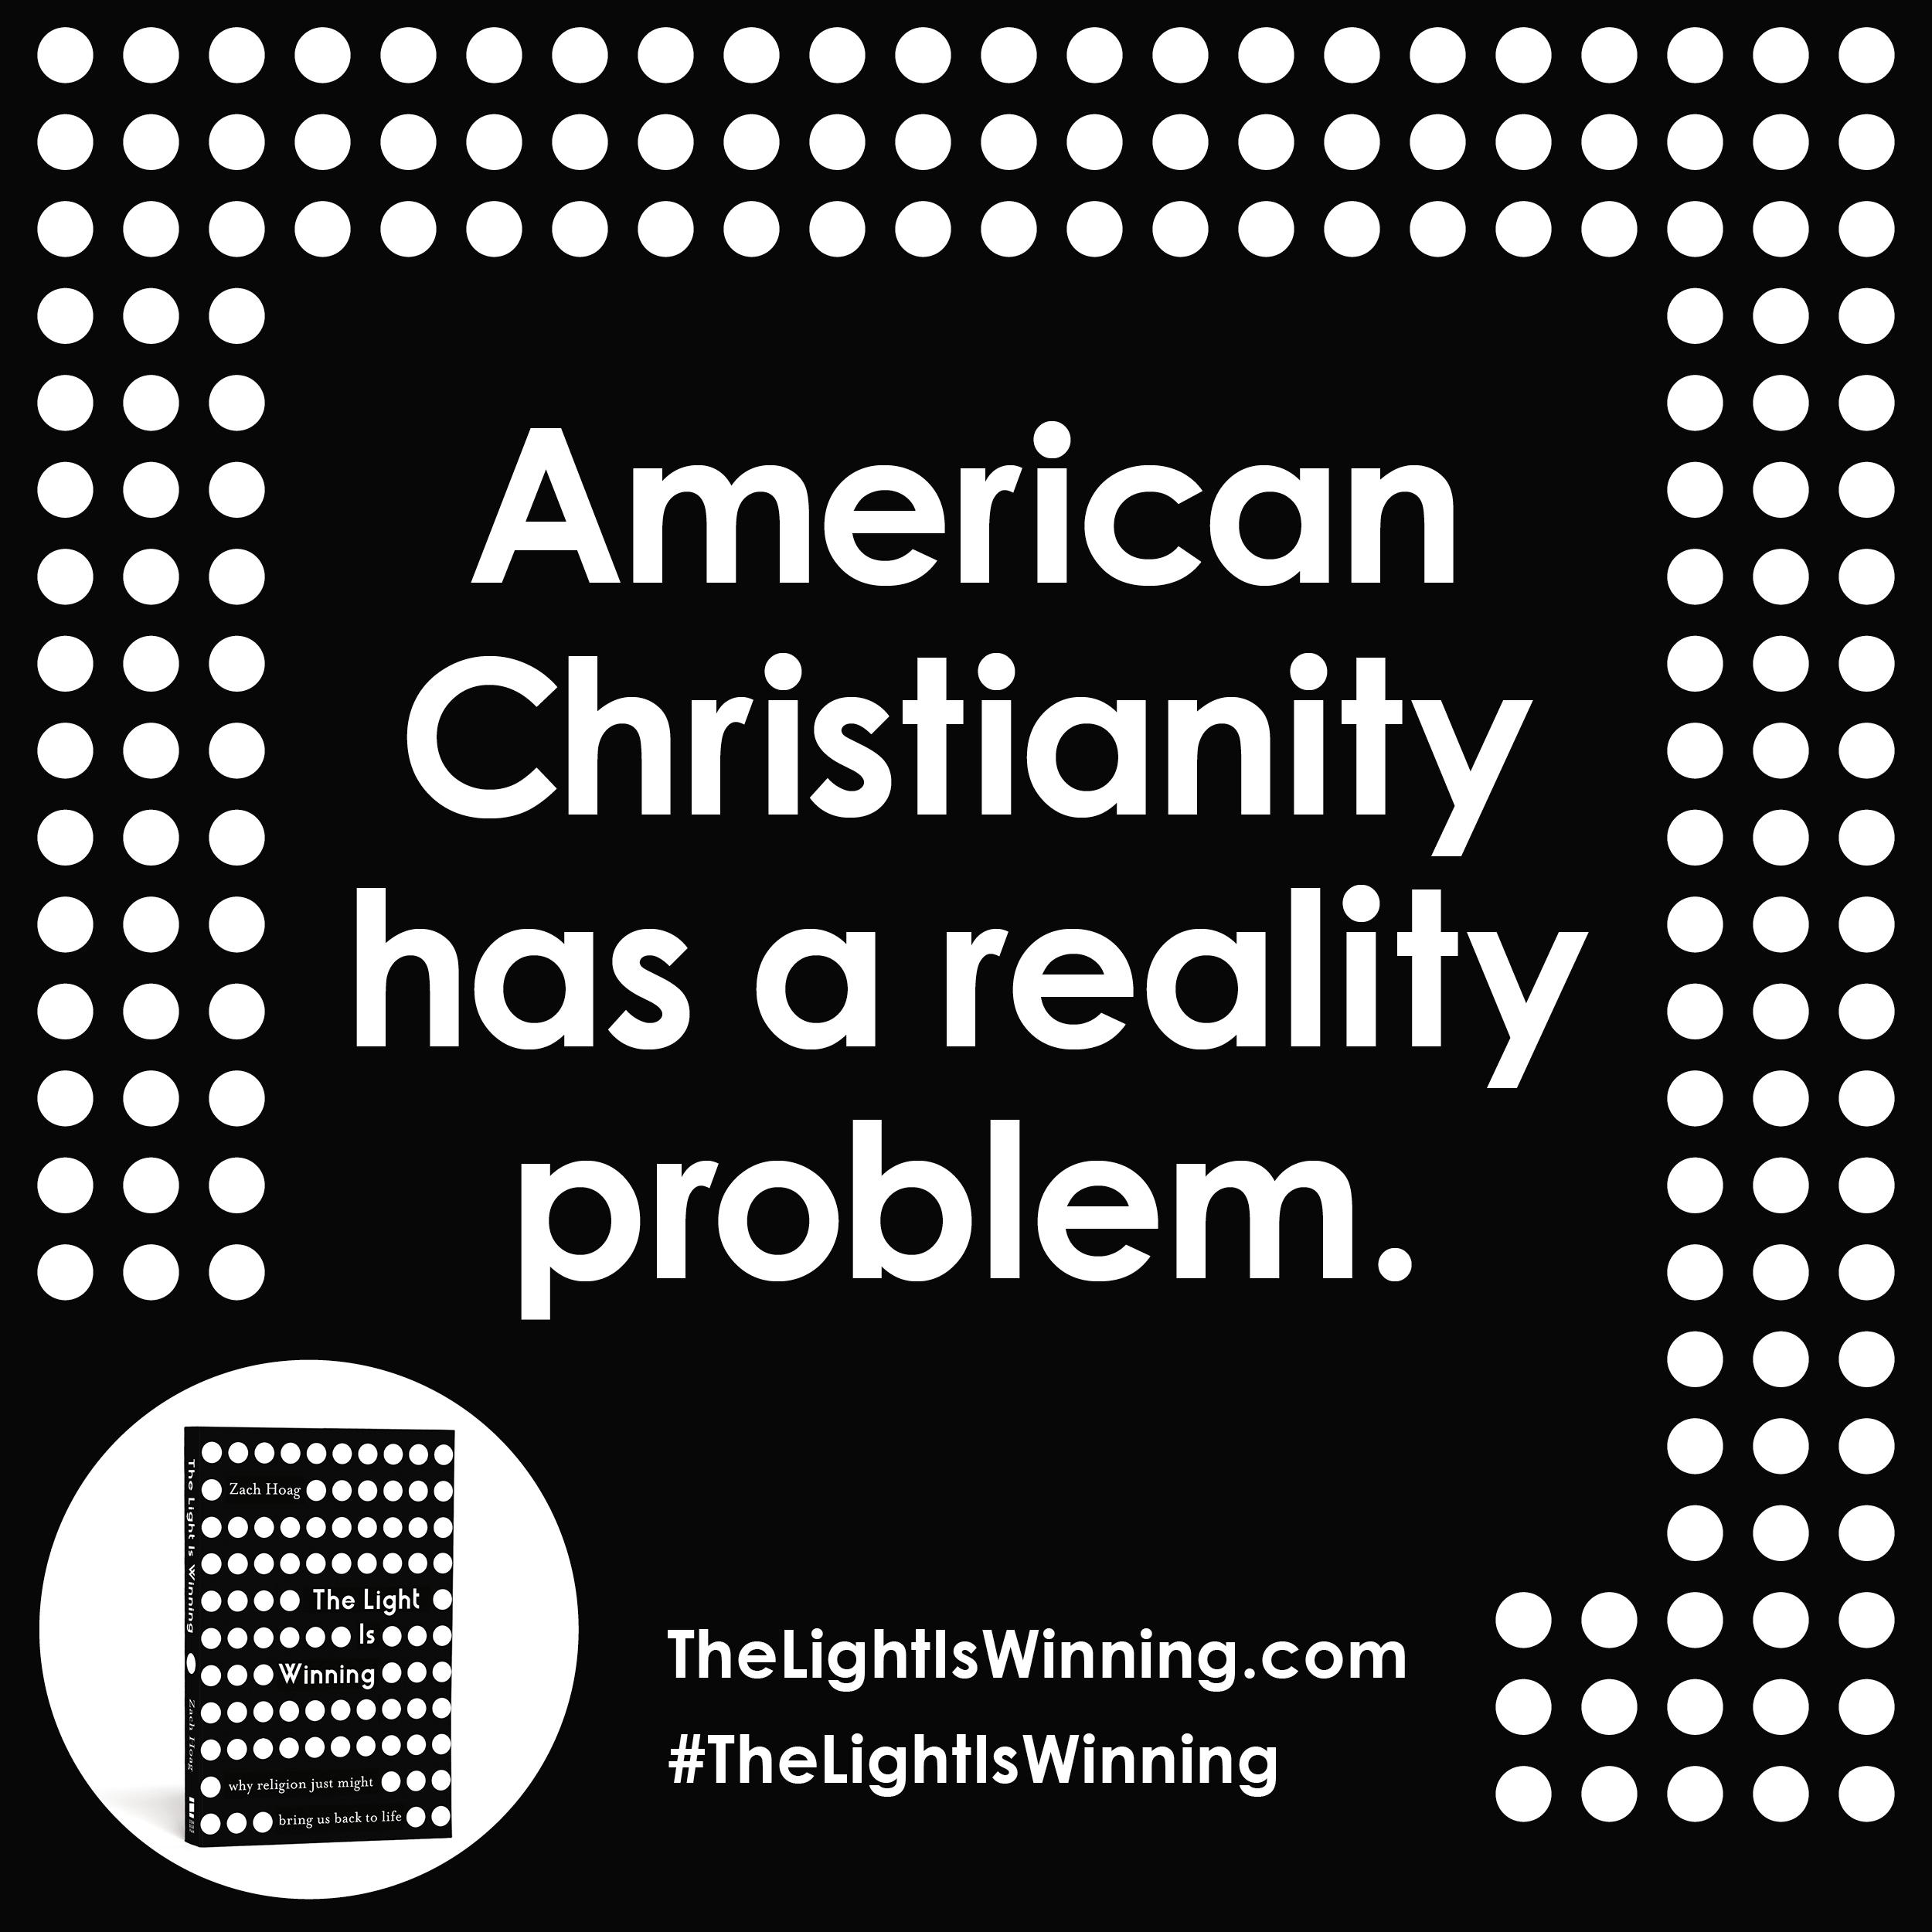 AmericanChristianity.jpg